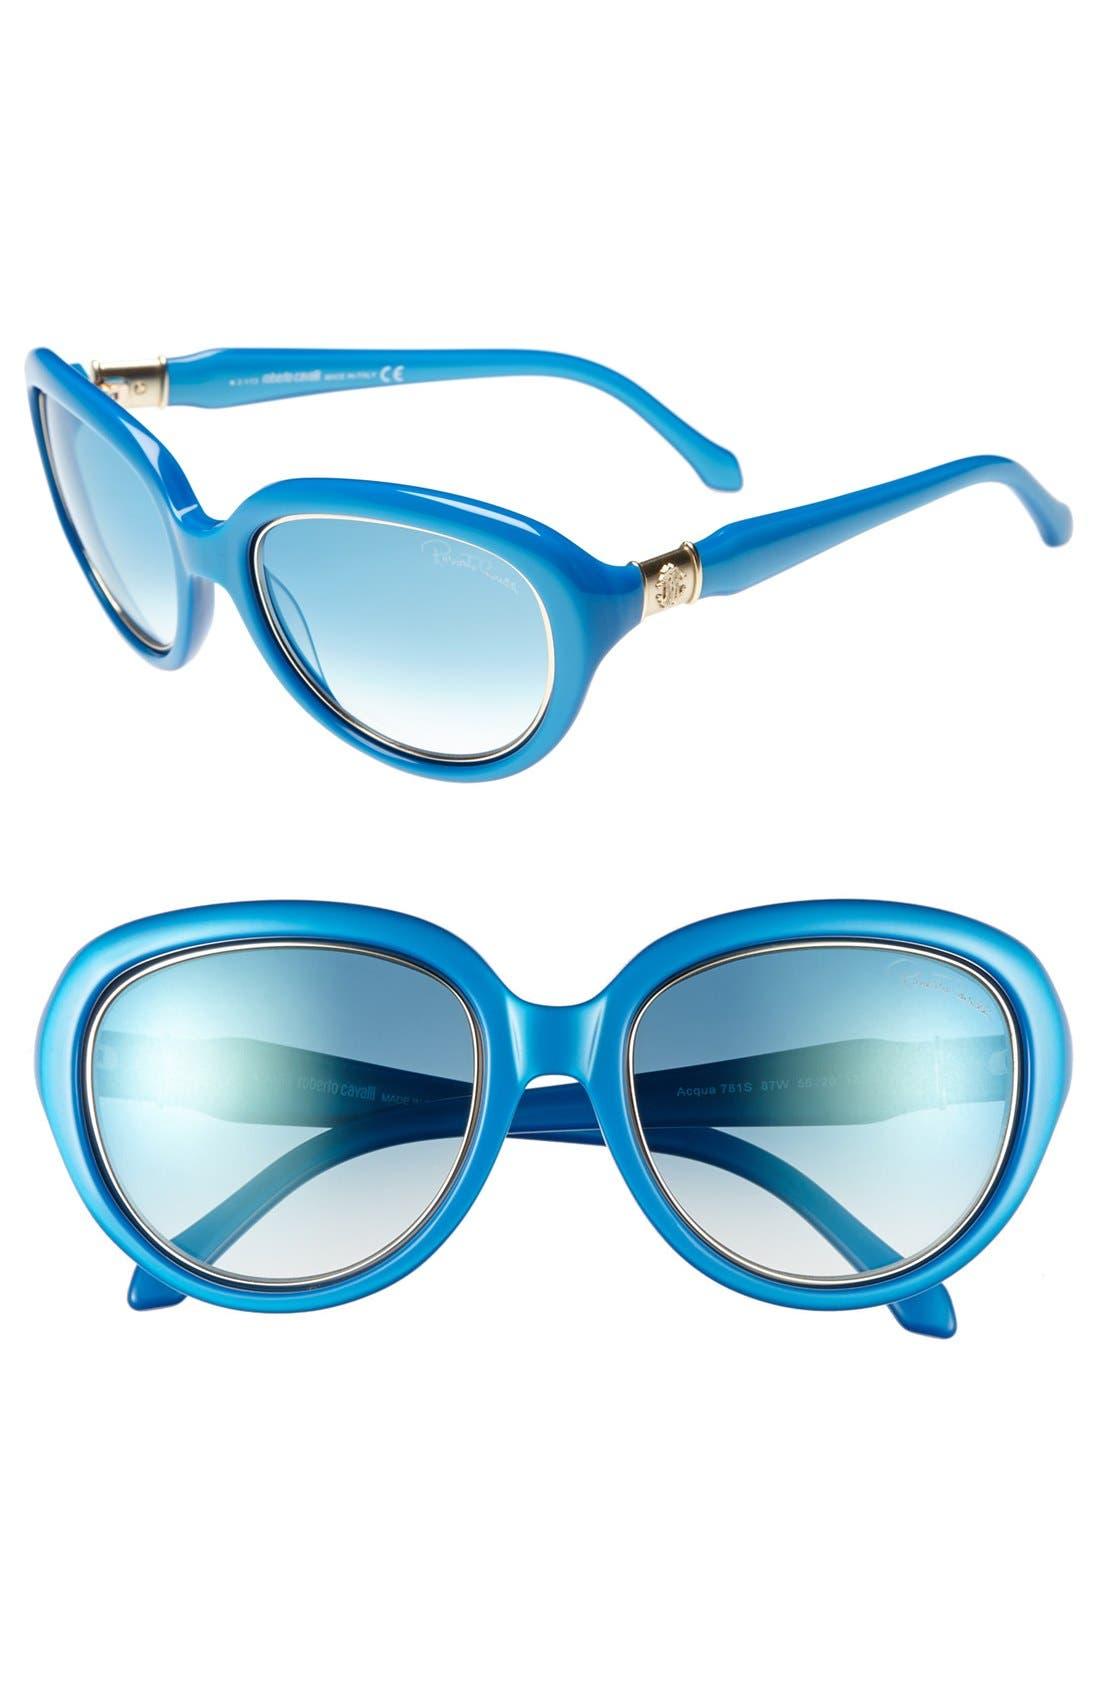 Main Image - Roberto Cavalli 'Acqua' 56mm Sunglasses